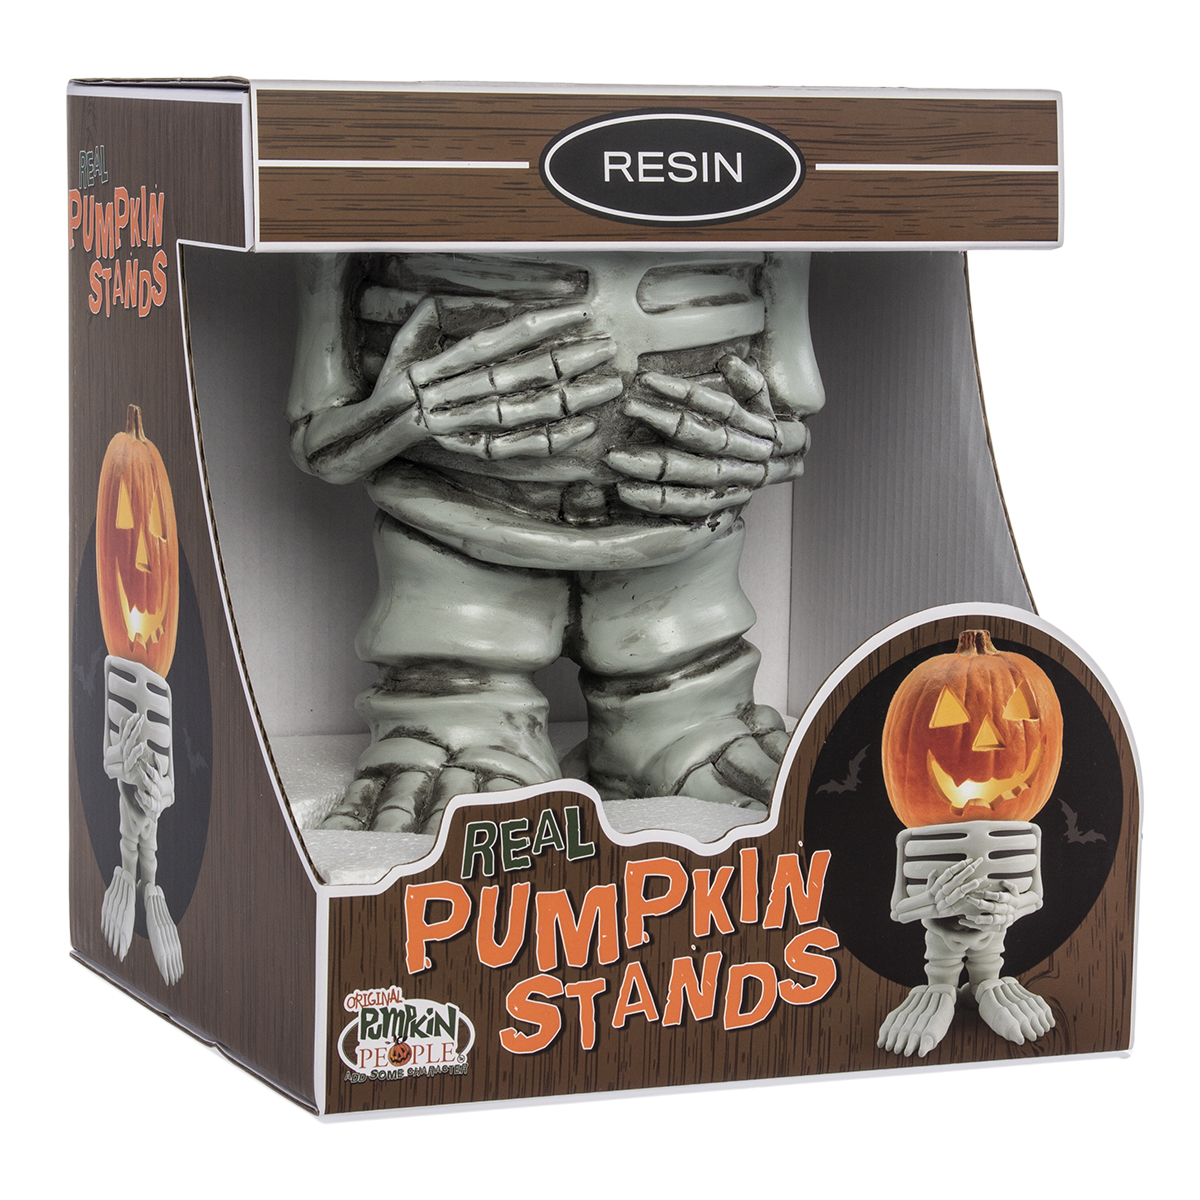 Pumpkin Stand Halloween Display Large Jackolantern Holder Indoor Outdoor Decor (Skeleton)